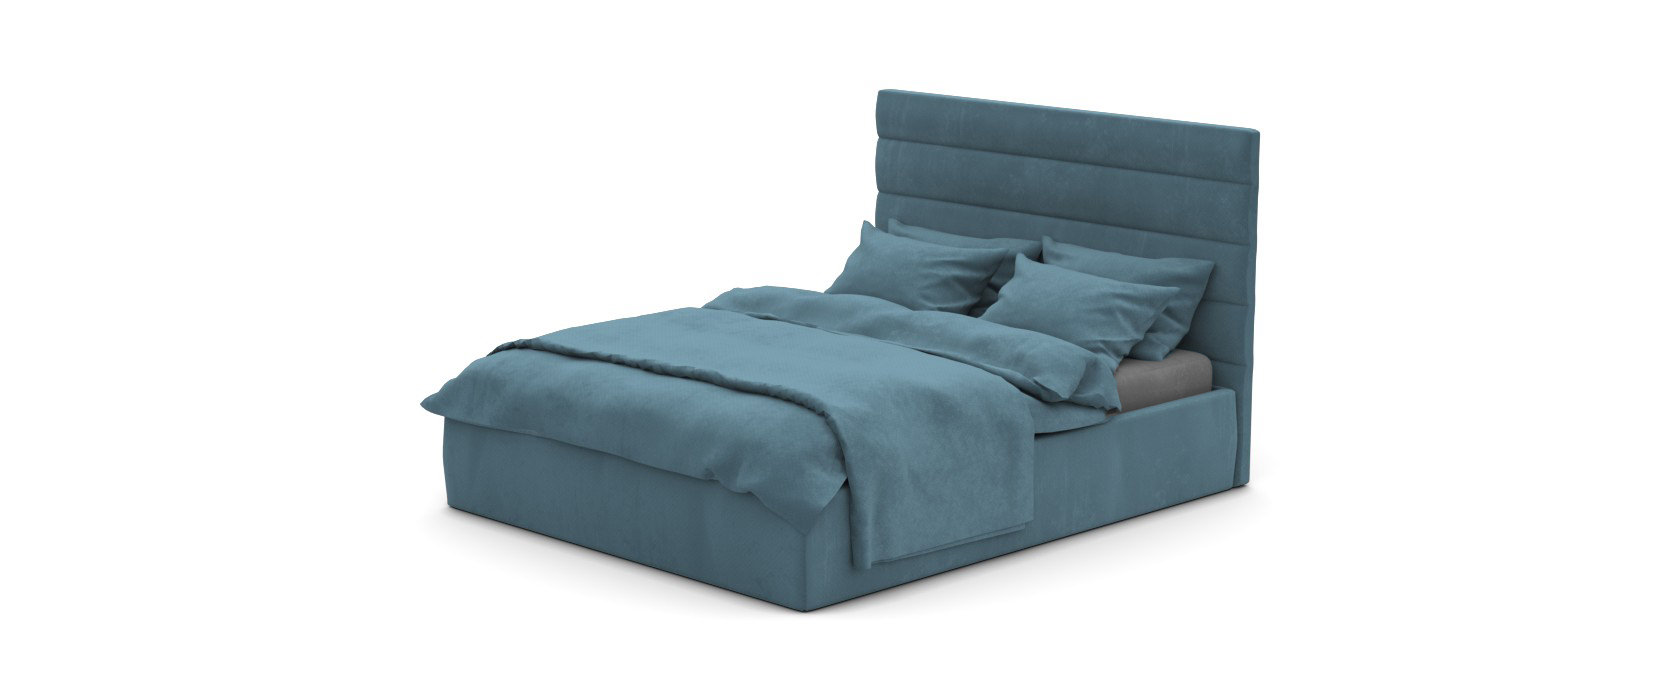 Ліжко Lucca